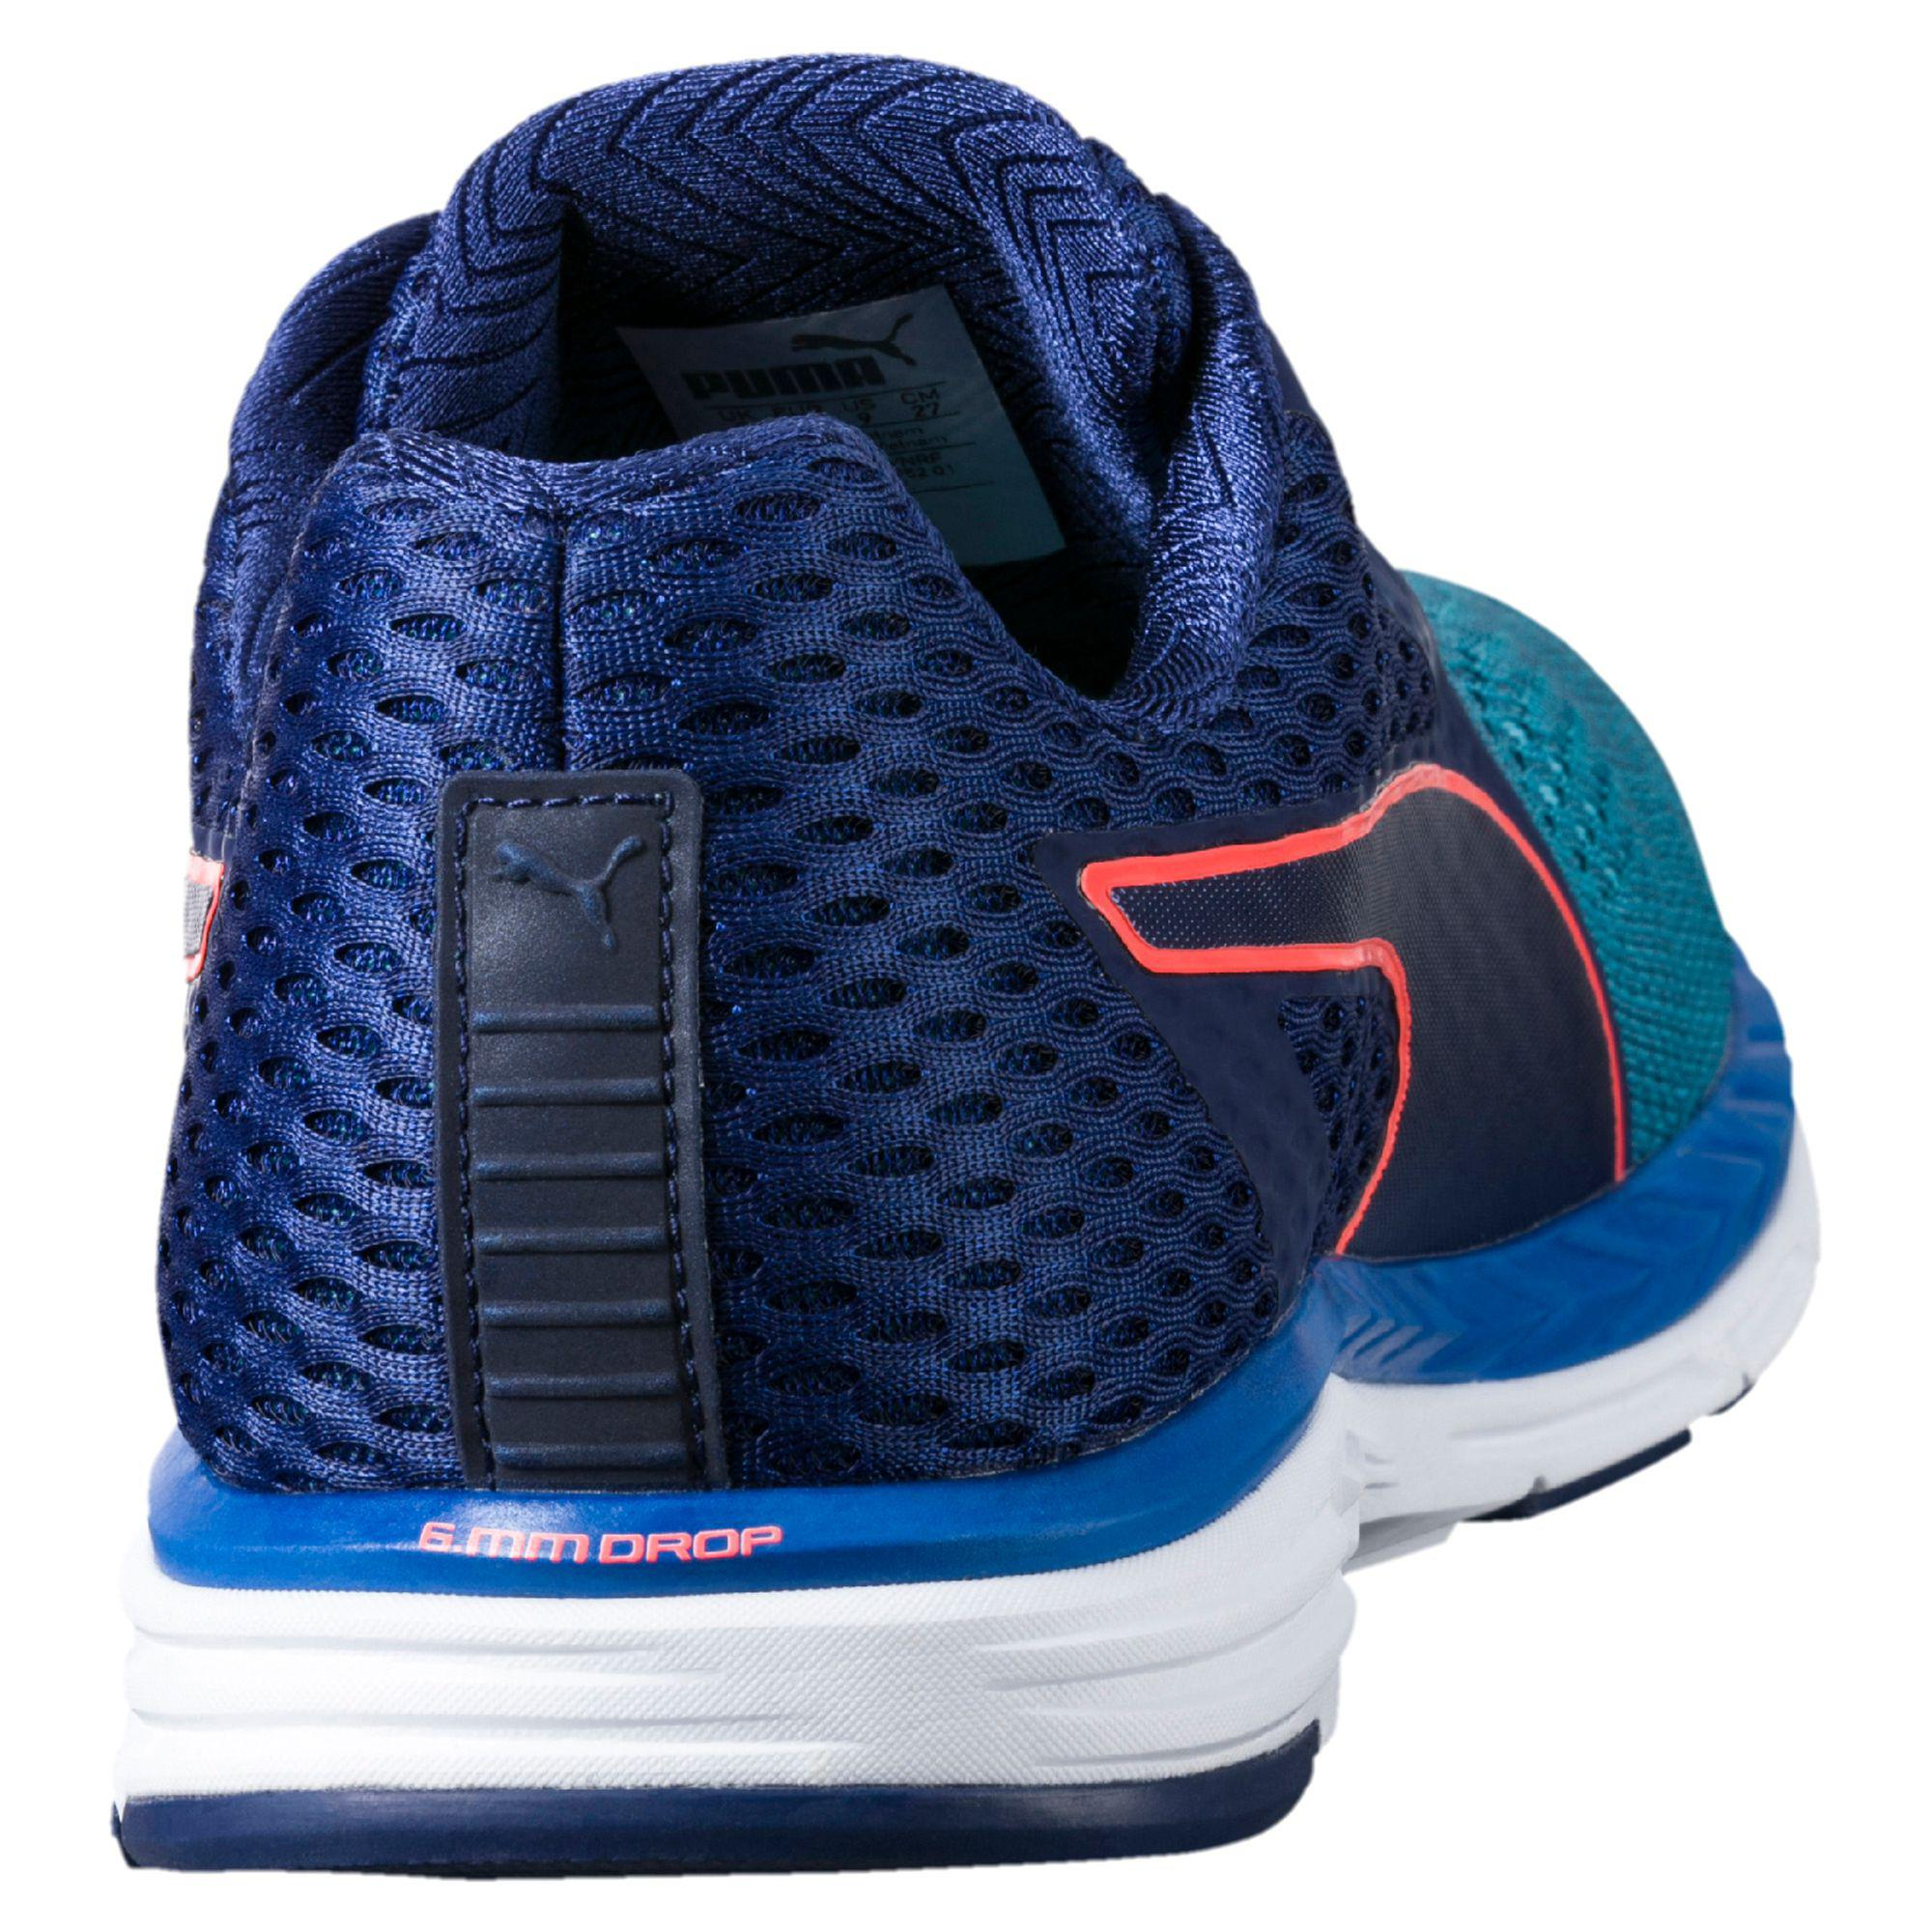 f4cf7a5de45ef4 Lyst - Puma Speed 500 Ignite 2 Men s Running Shoes in Blue for Men